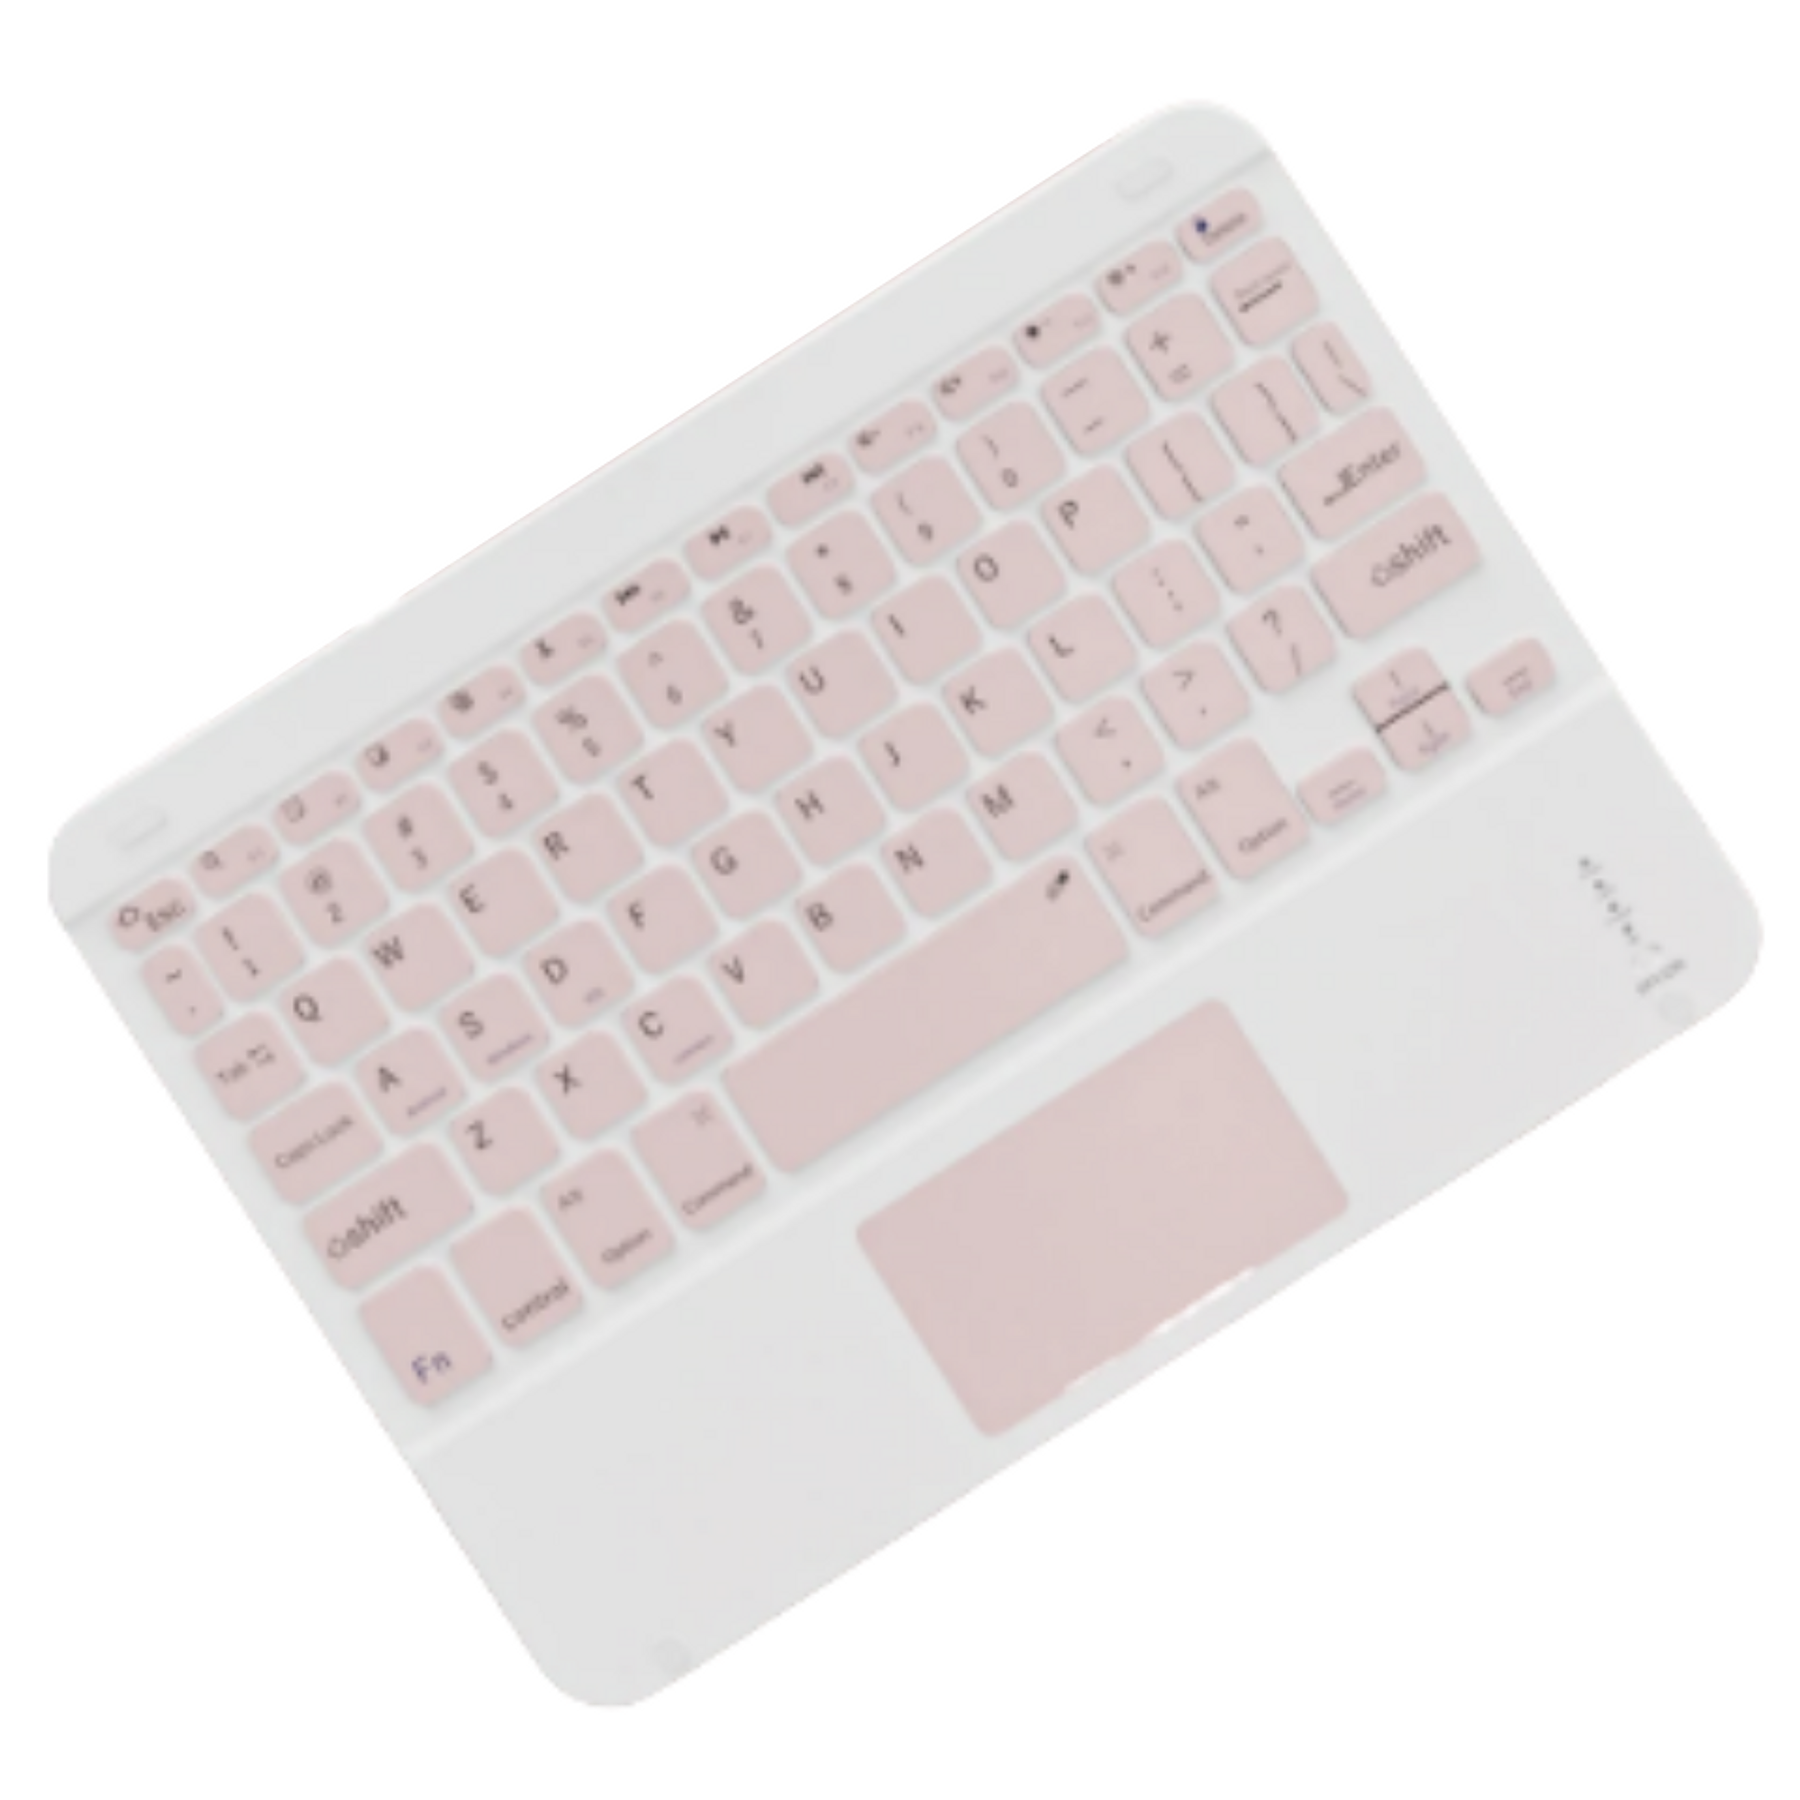 Teclado Bluetooth con Mouse (Color: Rosa)